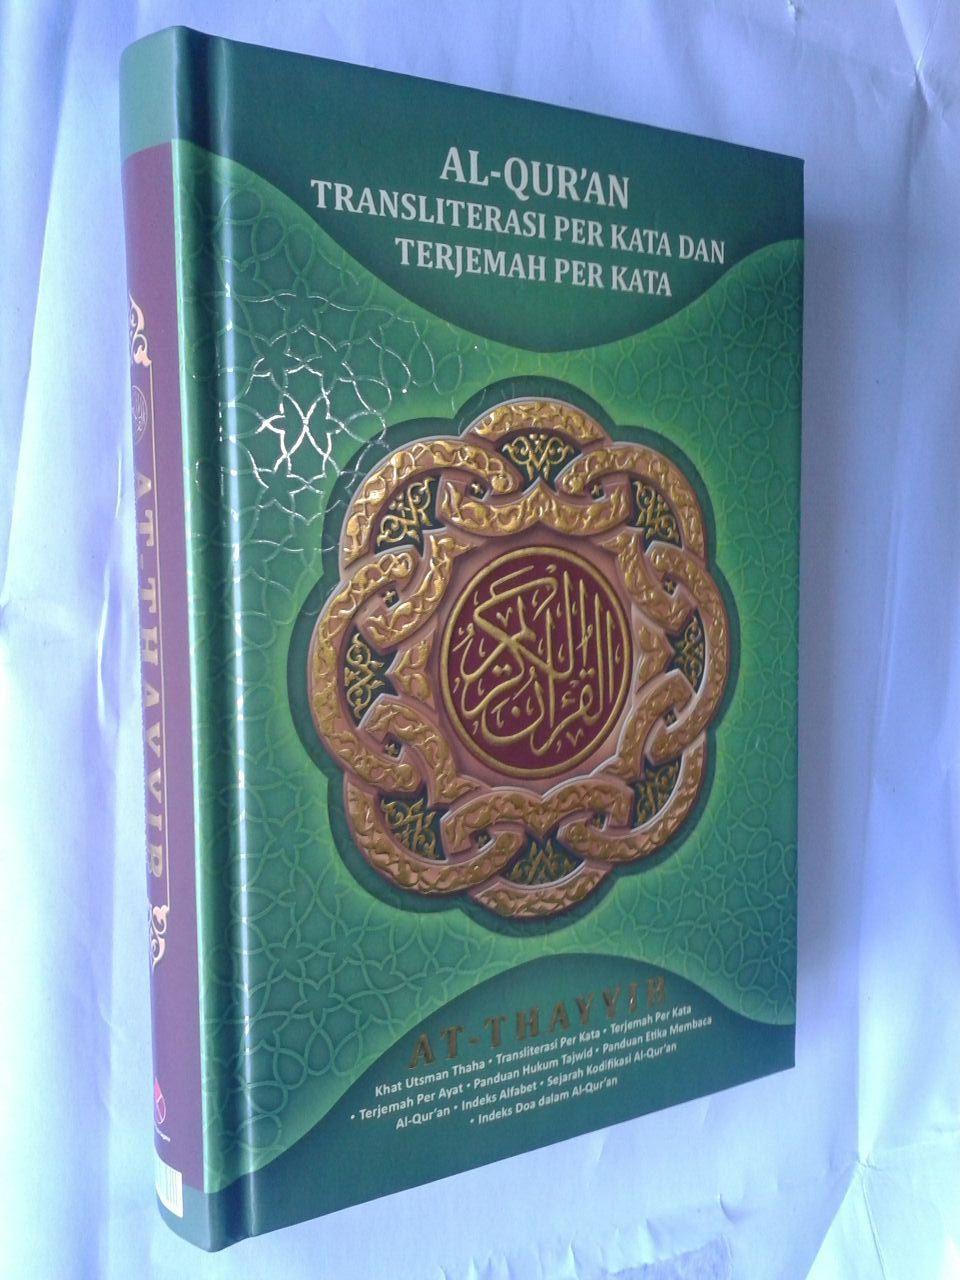 Al-Qur'an Transliterasi Perkata Terjemah Perkata Ath-Thayyib A5 cover 3